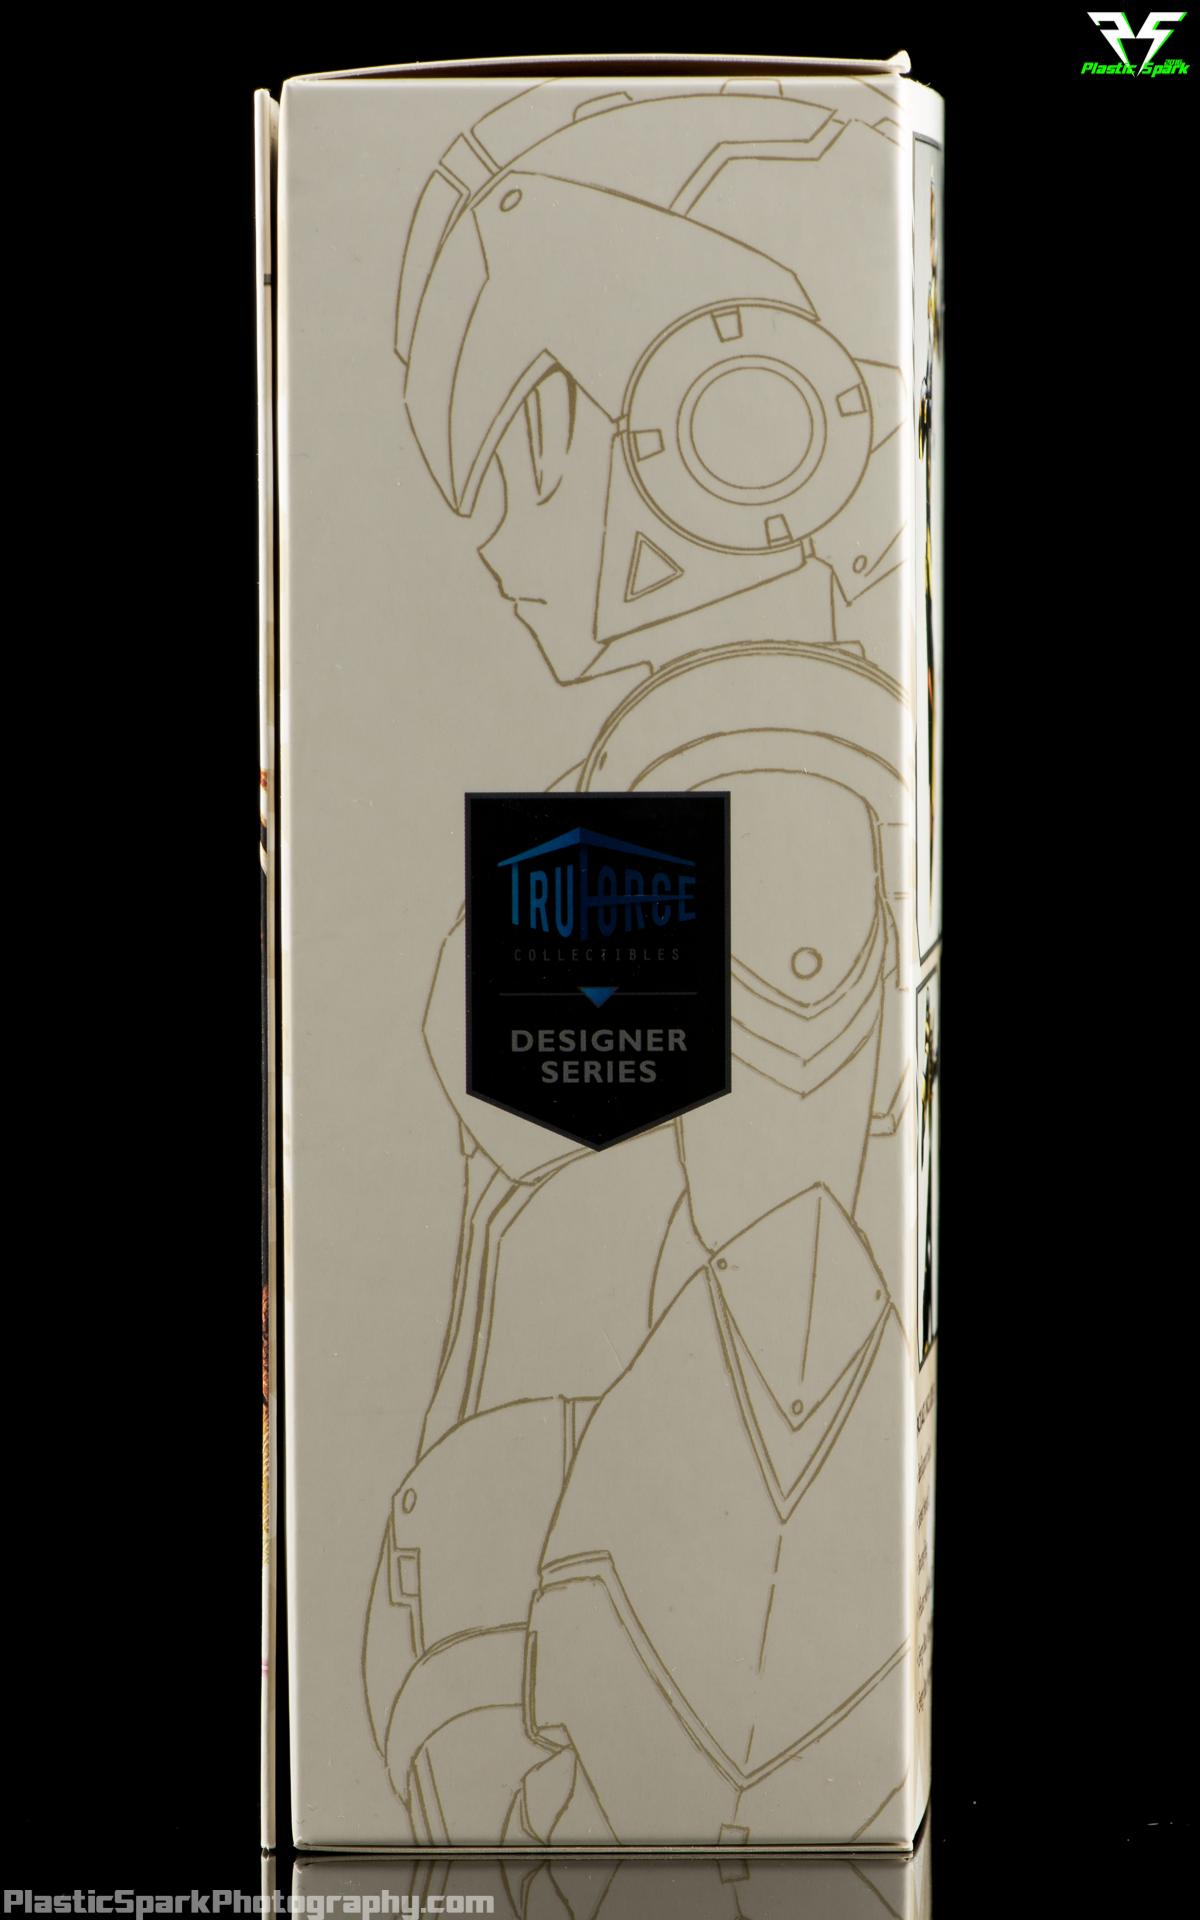 Truforce-Megaman-X-Kai-Packaging-(3-of-6).png